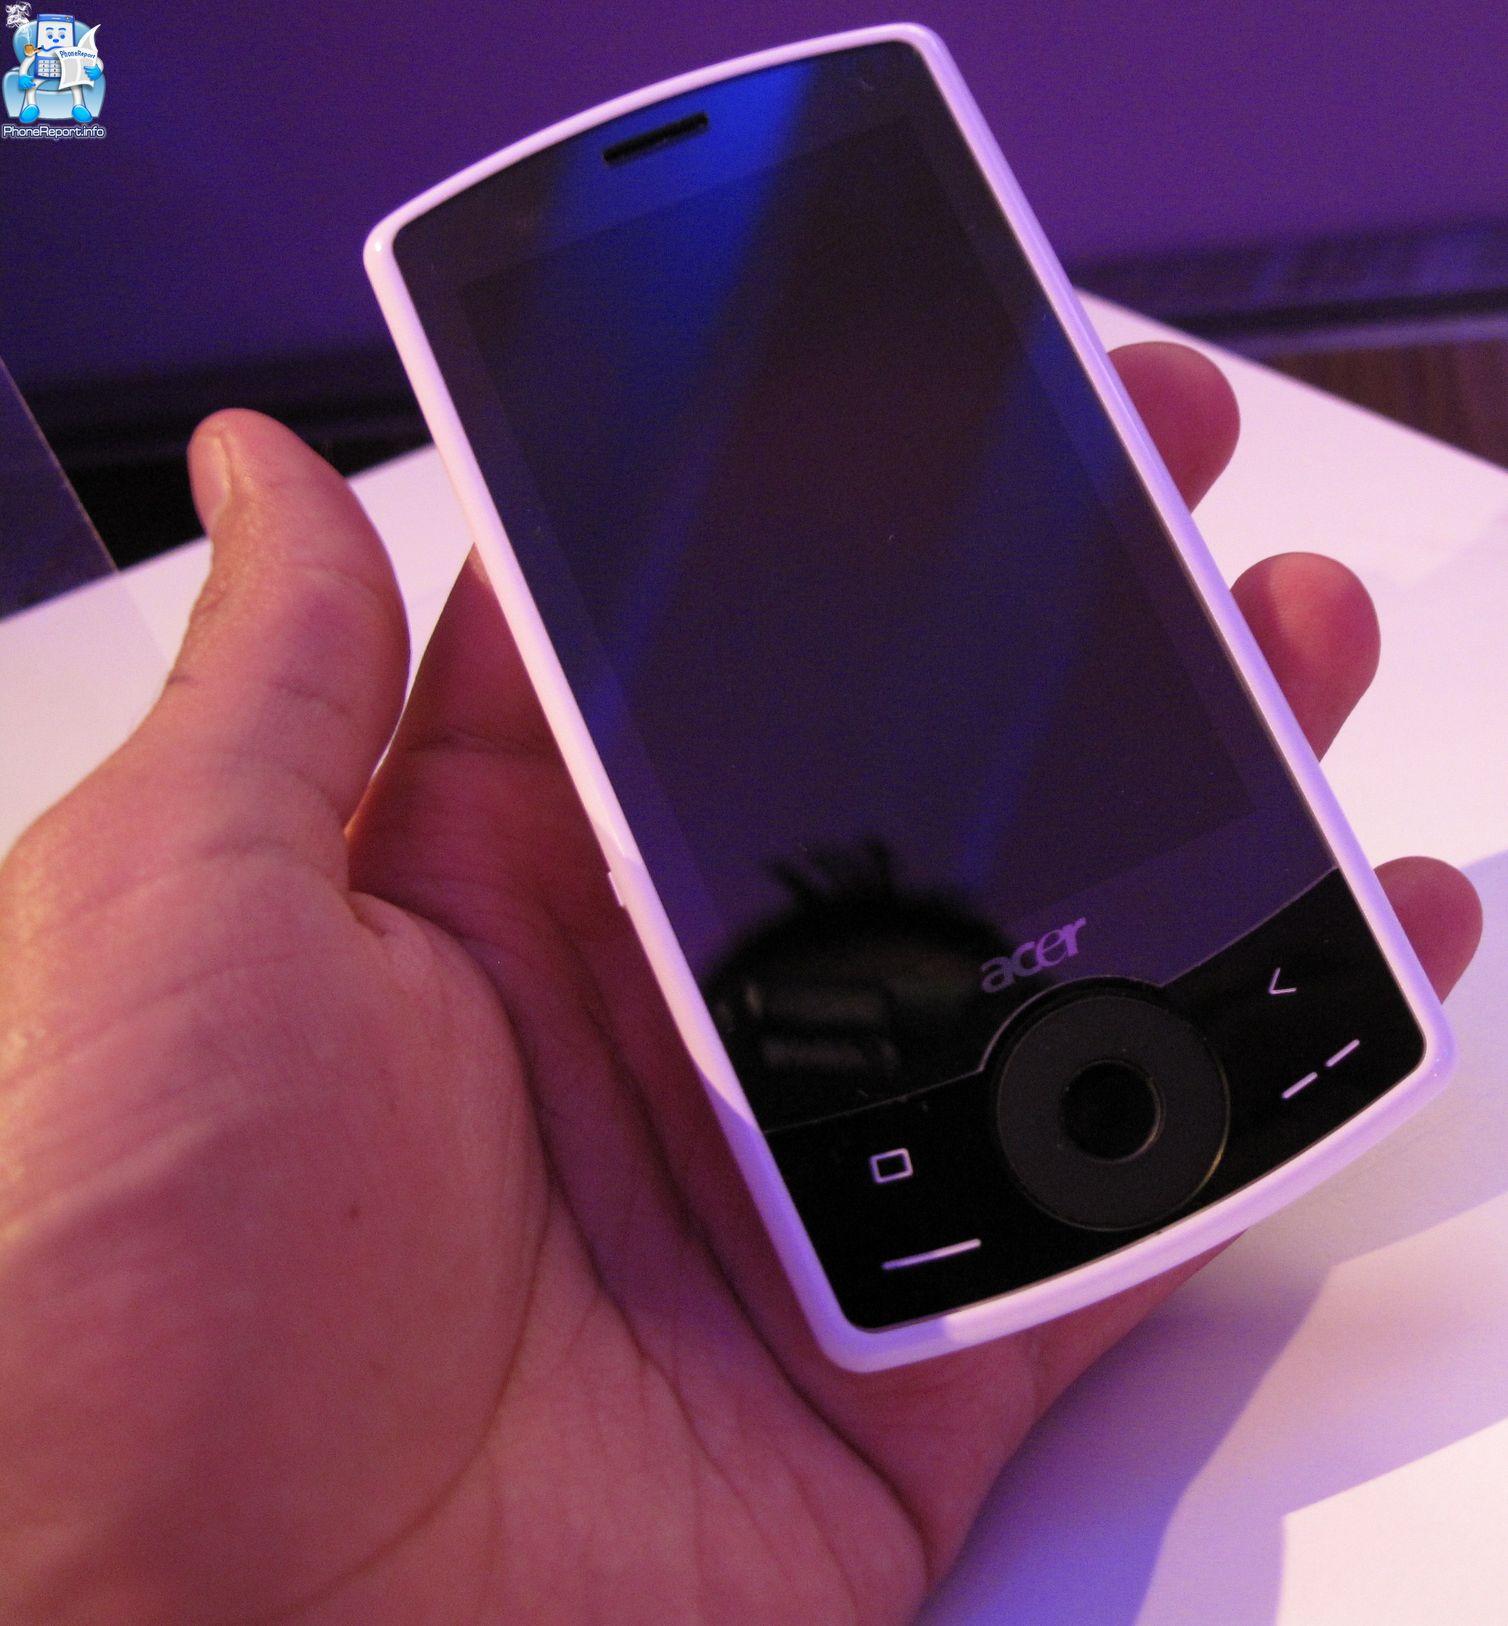 Acer creates department for touchscreen smartphones